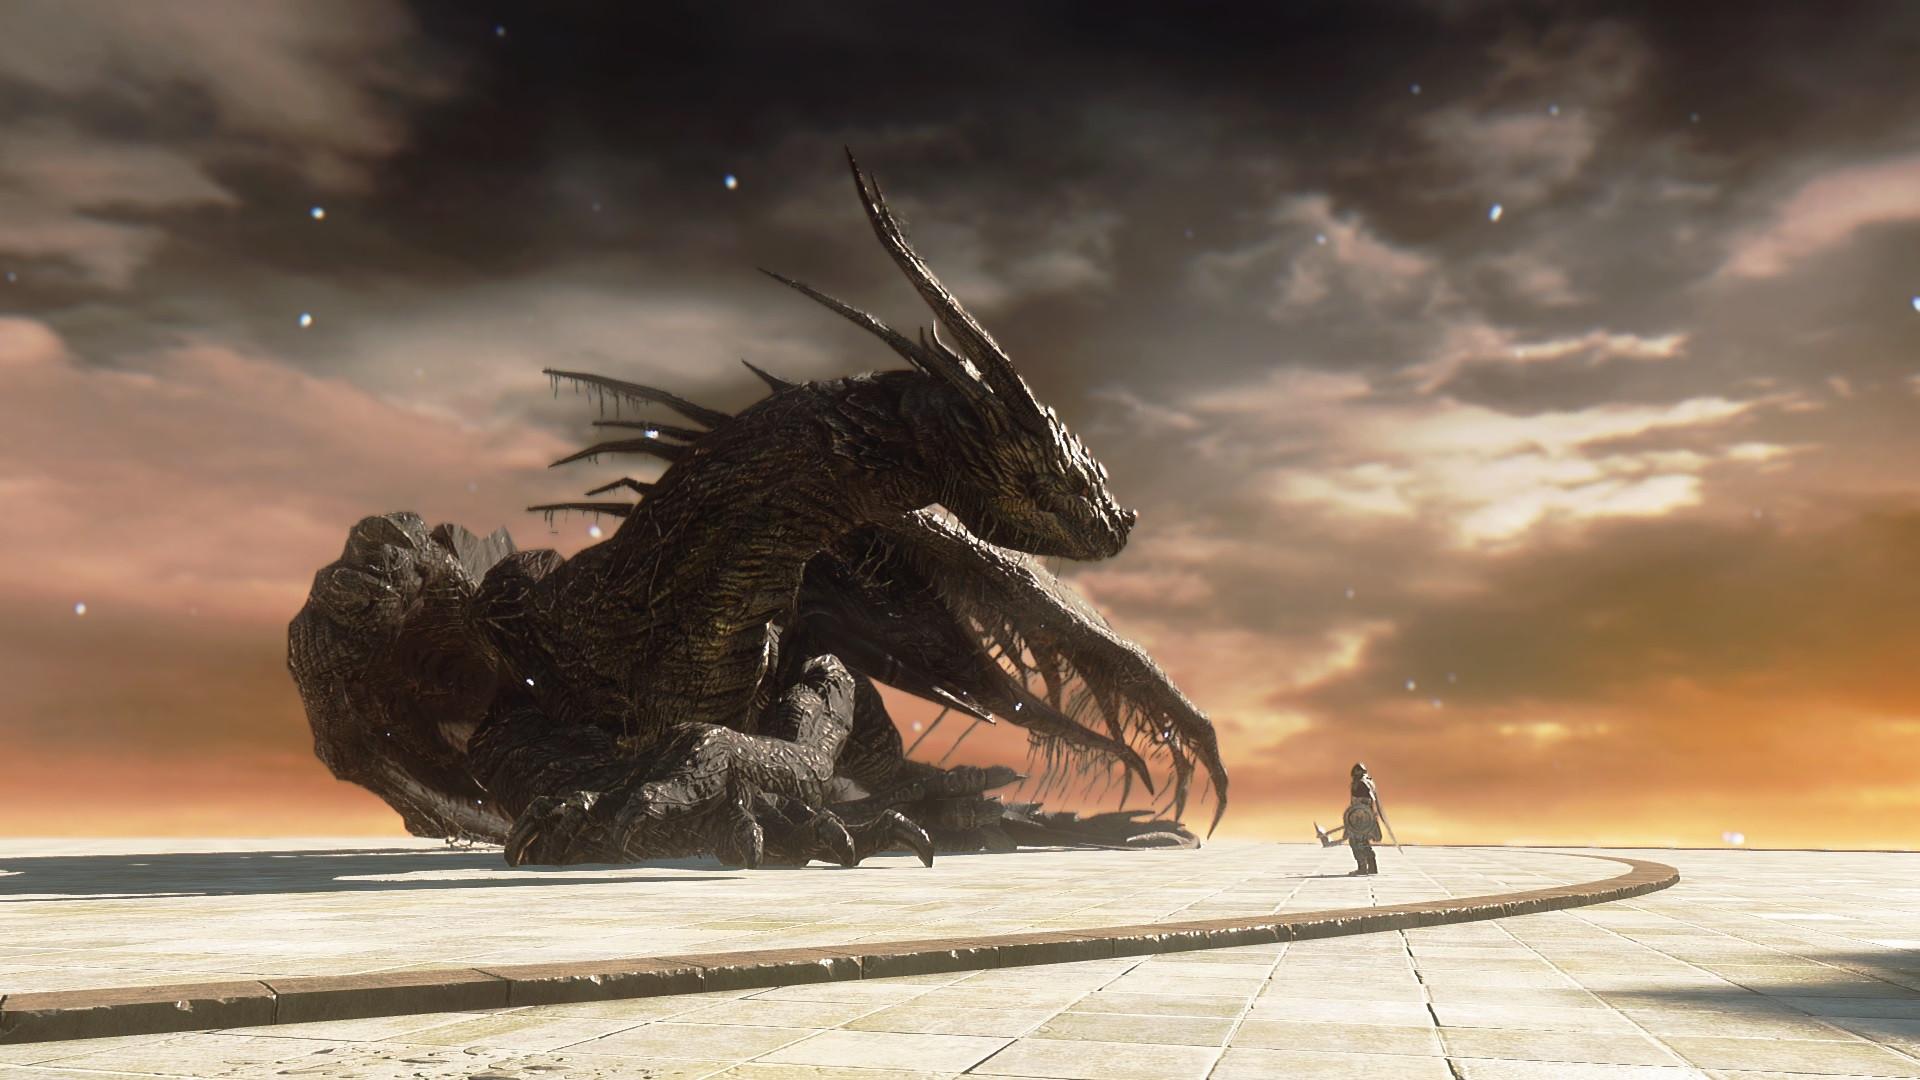 Dark Souls II [1920 x 1080] …